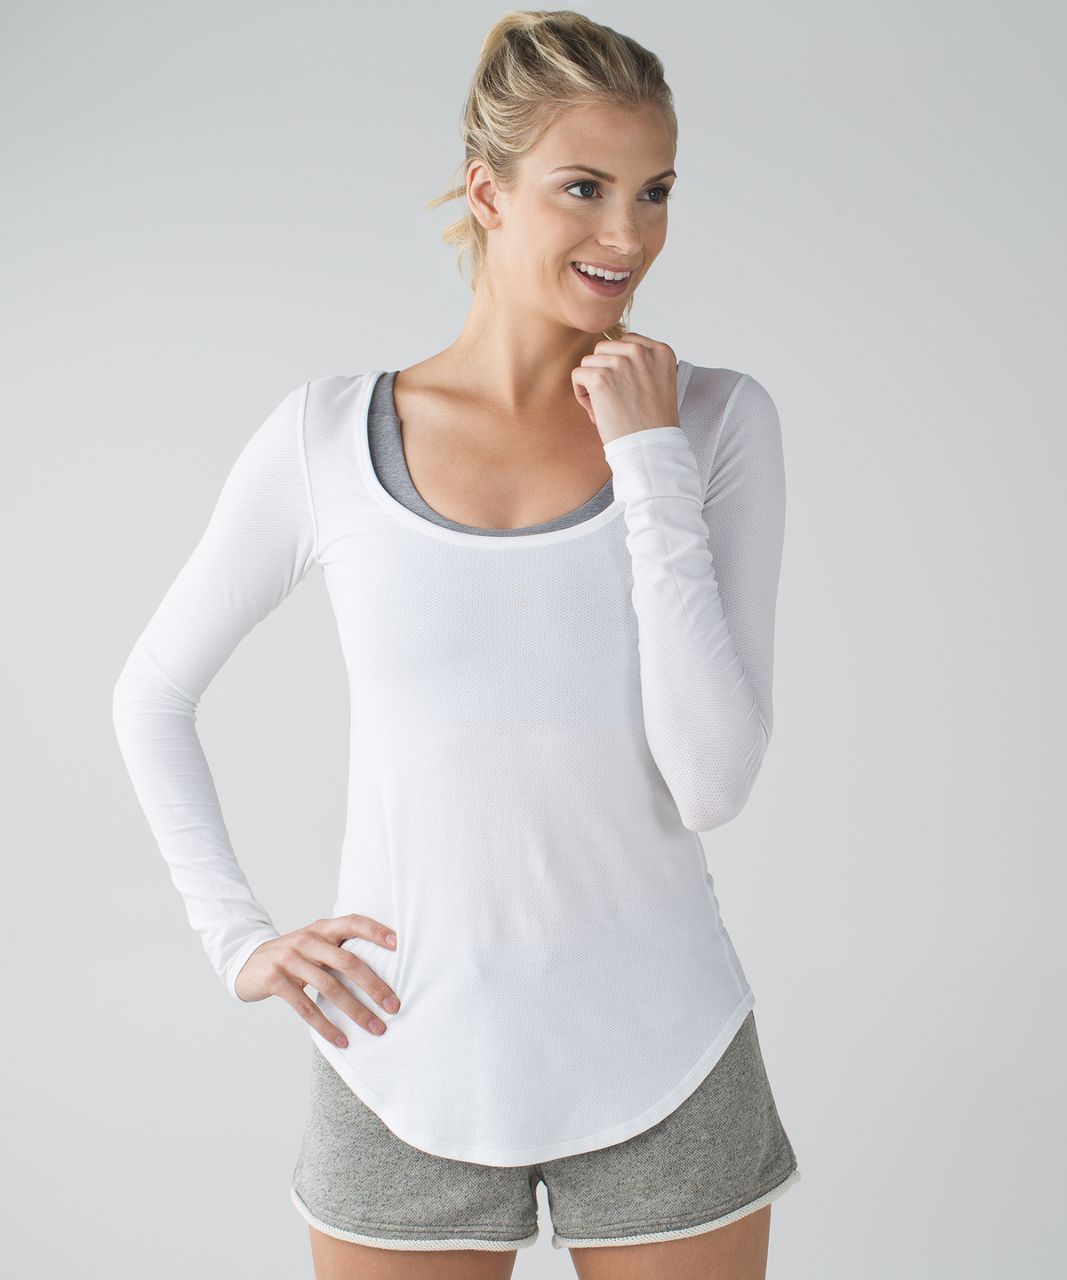 Lululemon Inner Essence Long Sleeve Tee - White